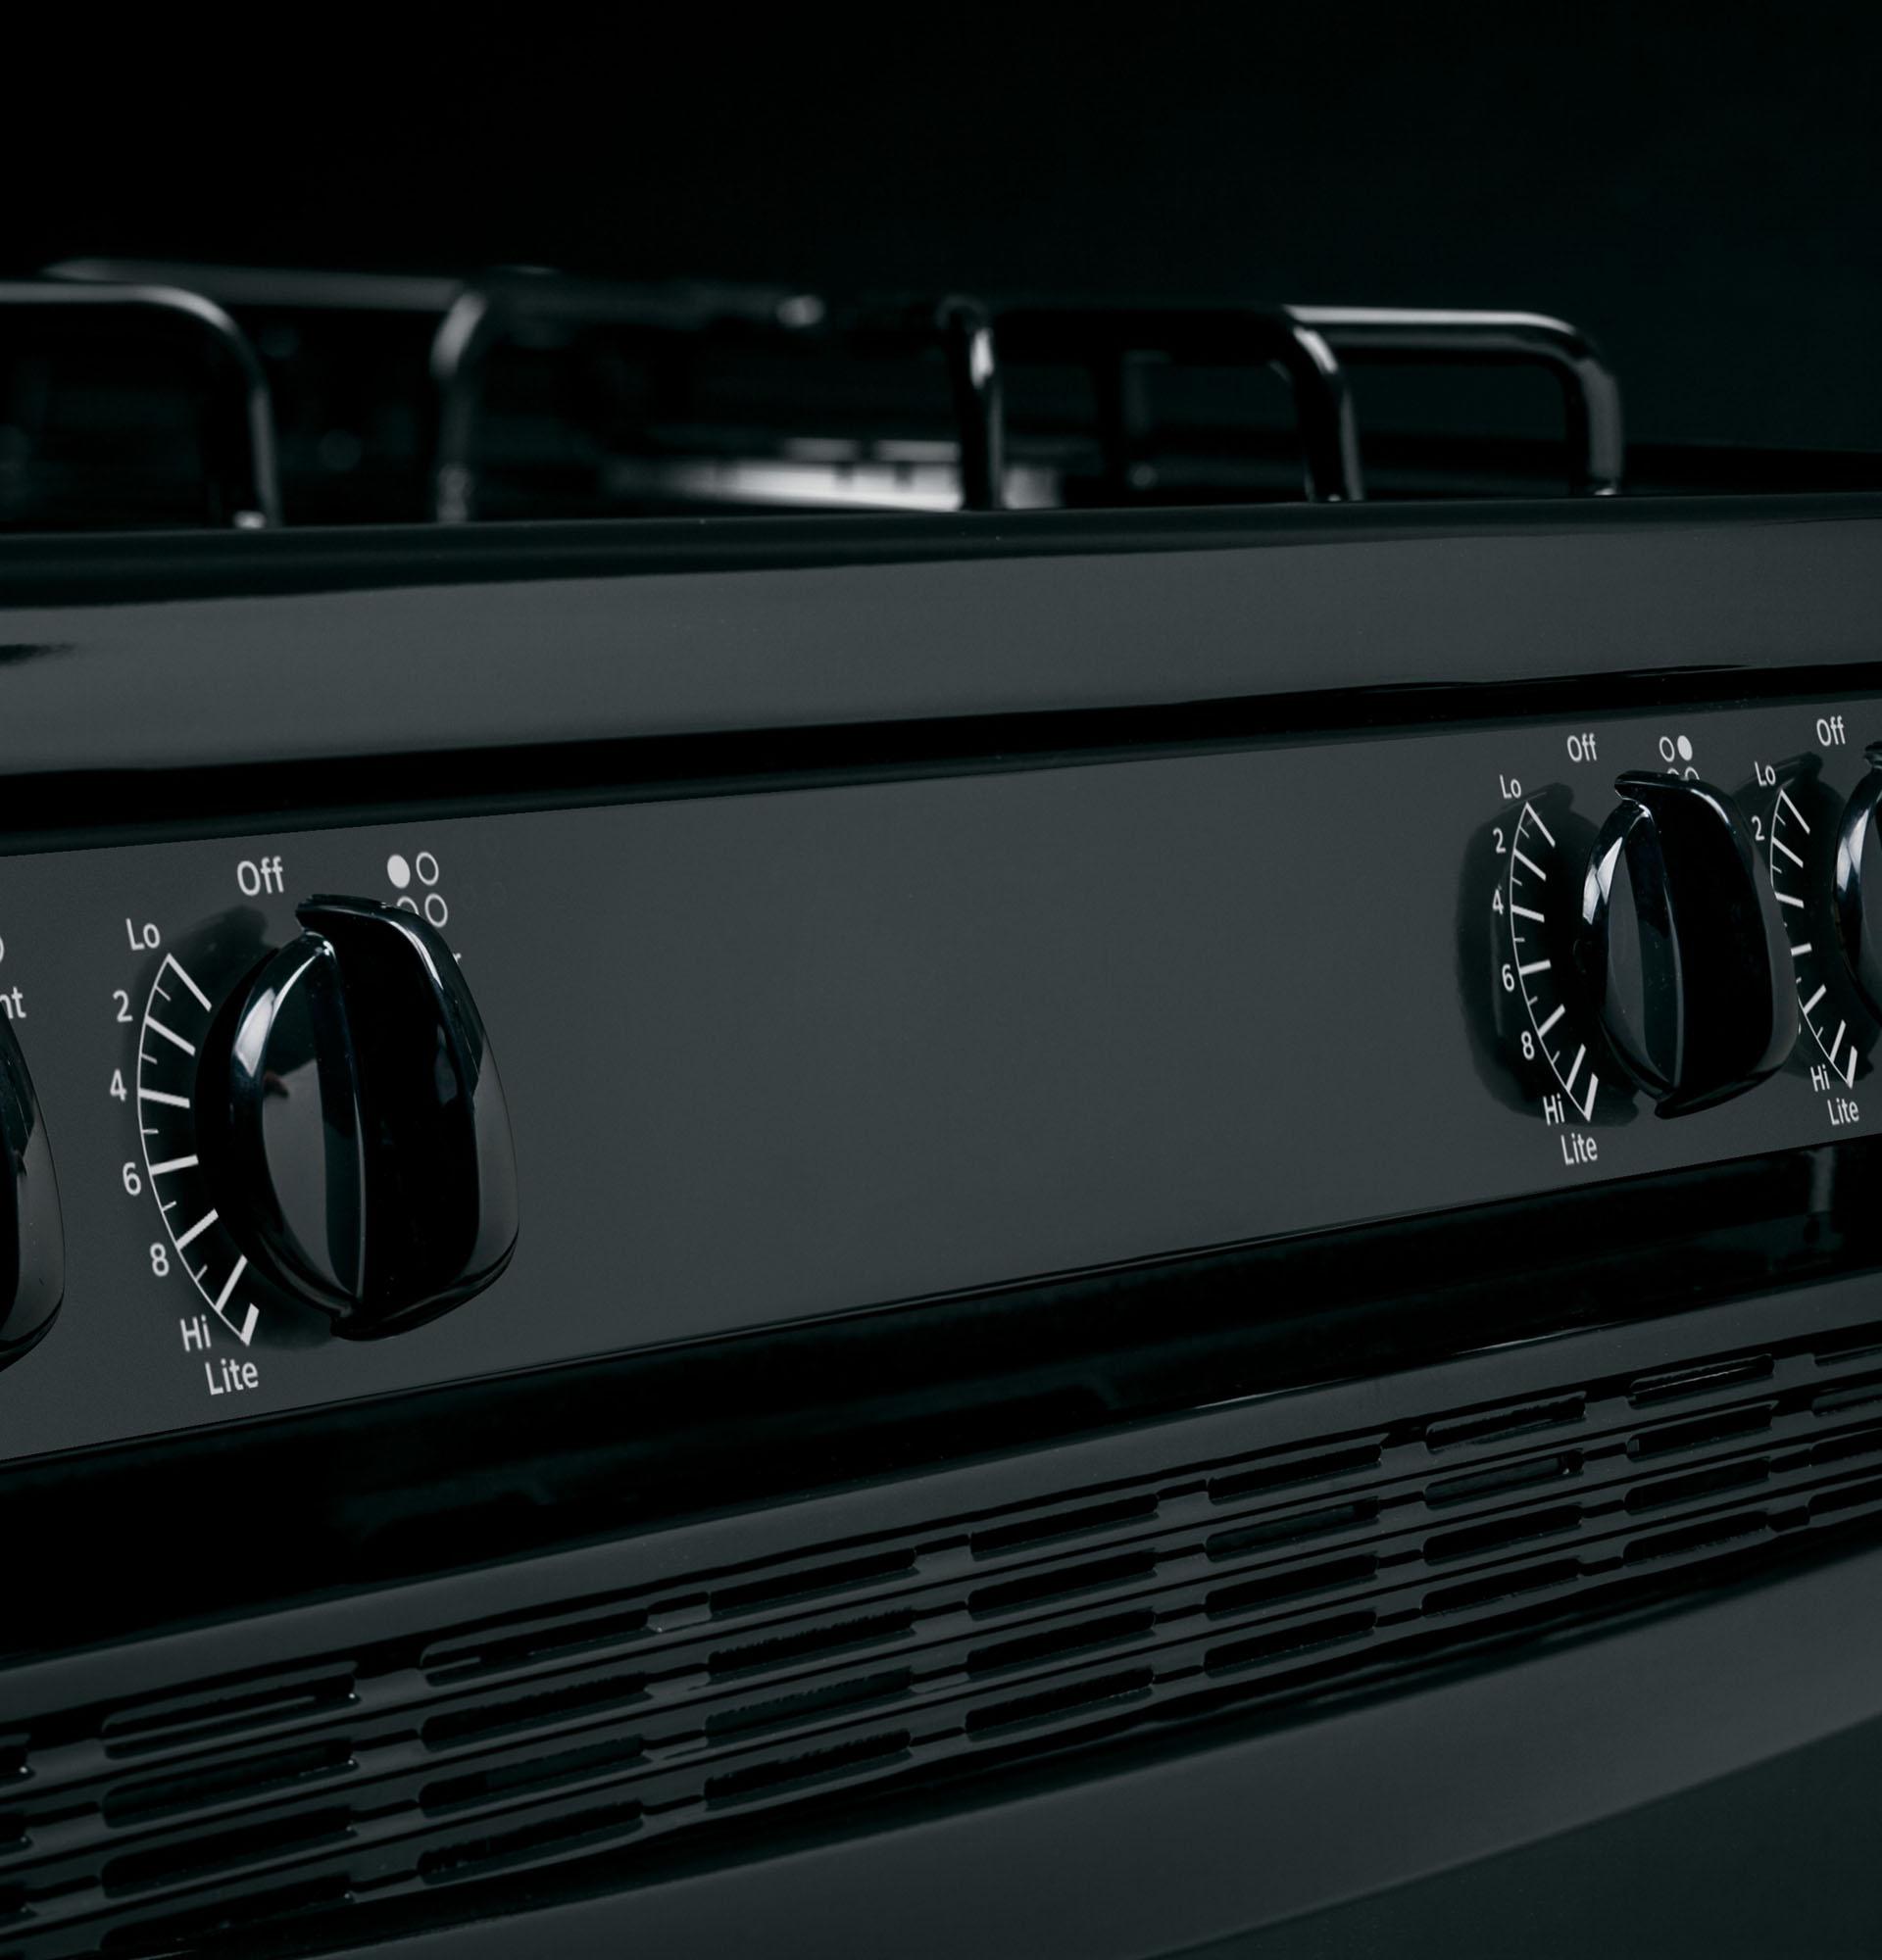 Hotpoint RGB530DEHBB 4.8 cu. ft. Freestanding Gas Range - Black